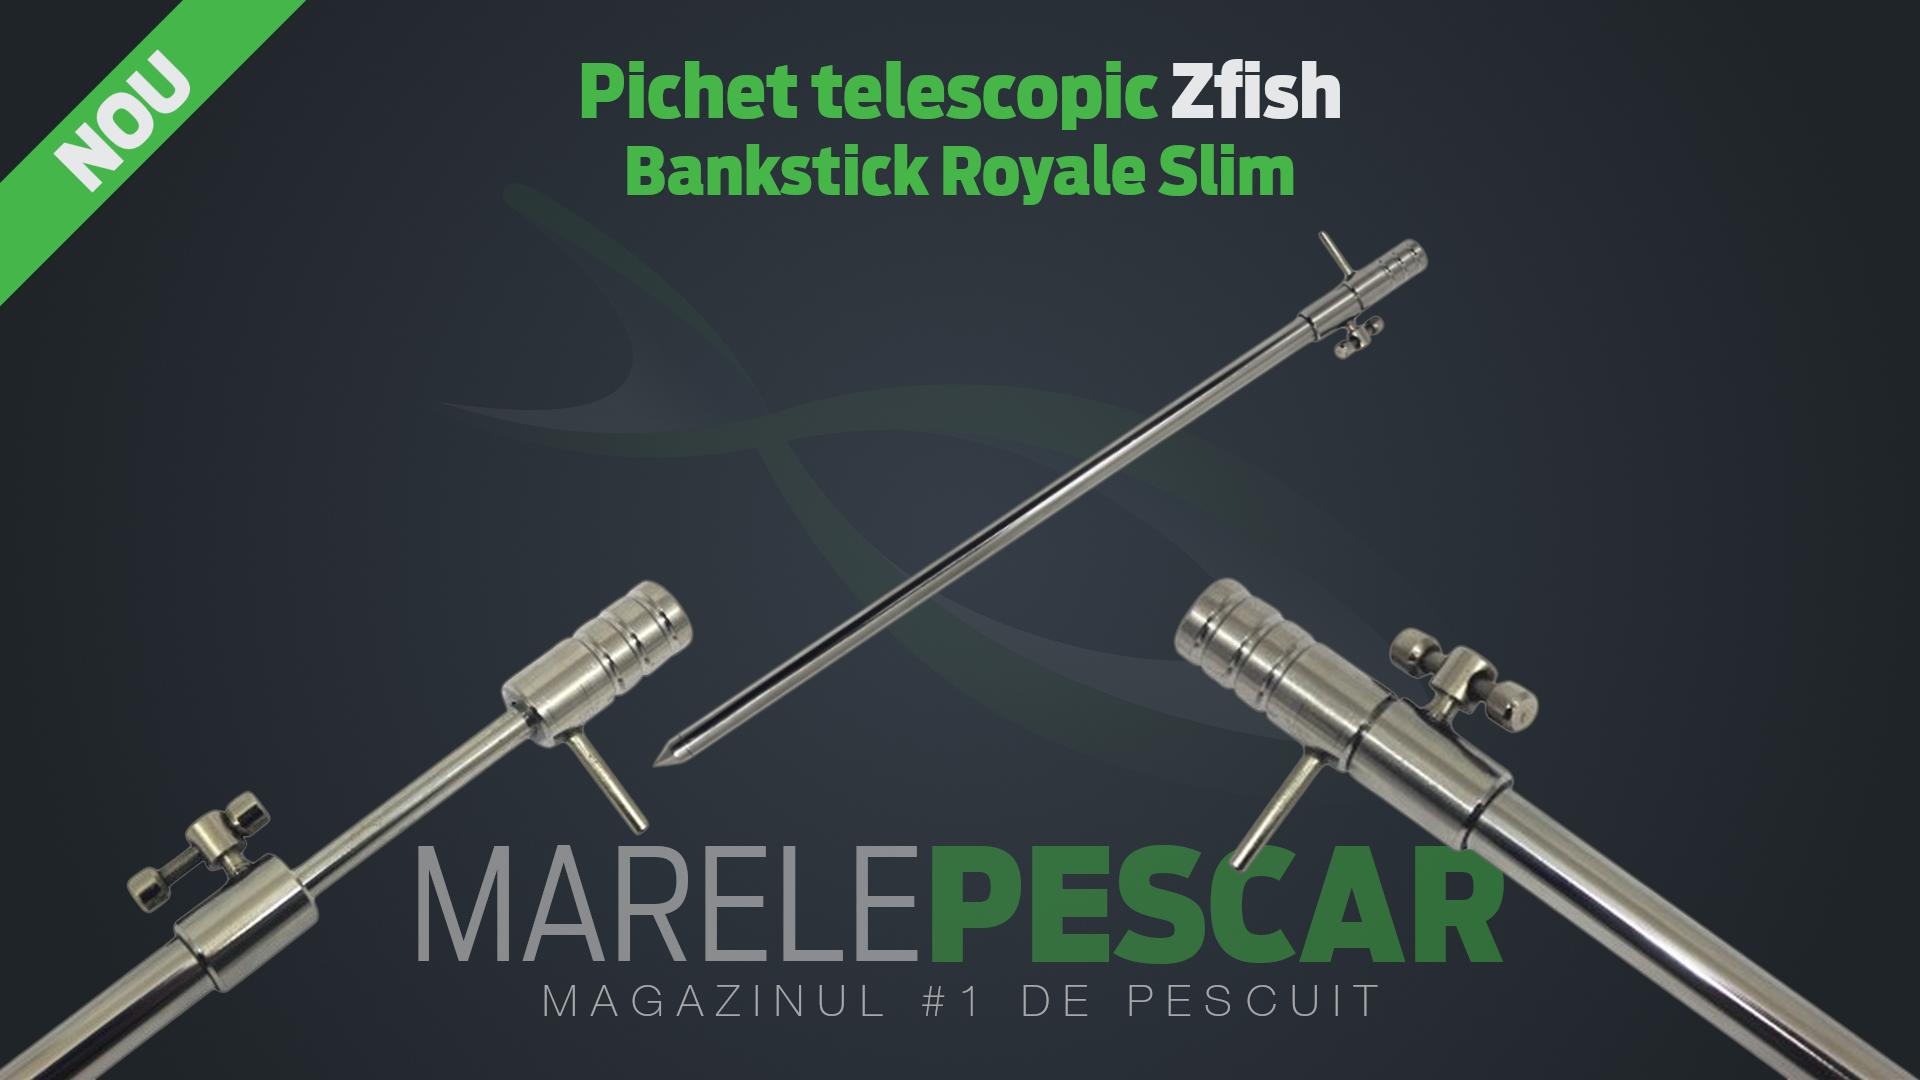 Pichet telescopic Zfish Bankstick Royale Slim